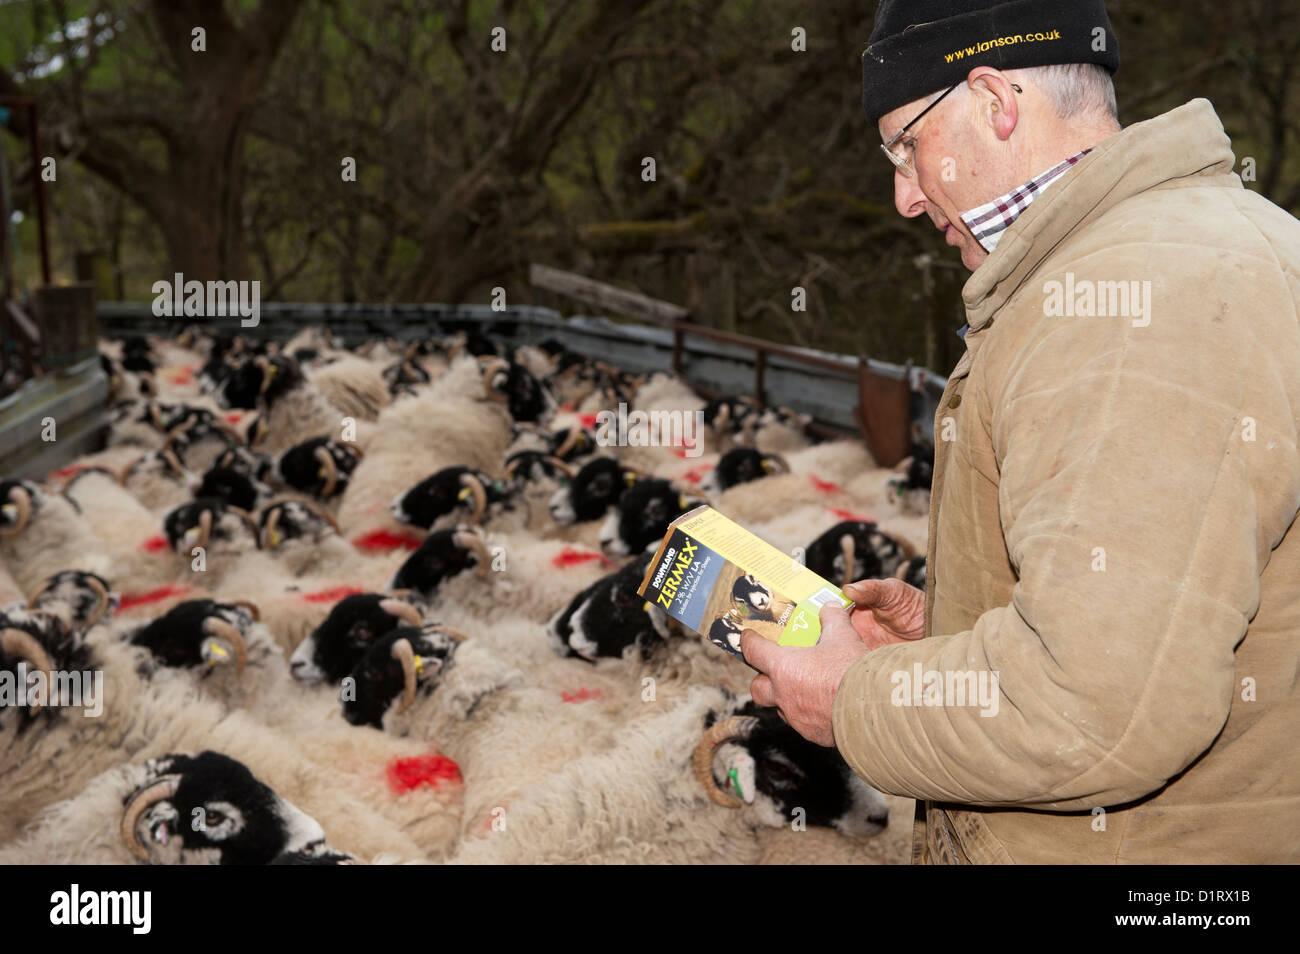 Farmer reading instructions on animal medicine packet. - Stock Image